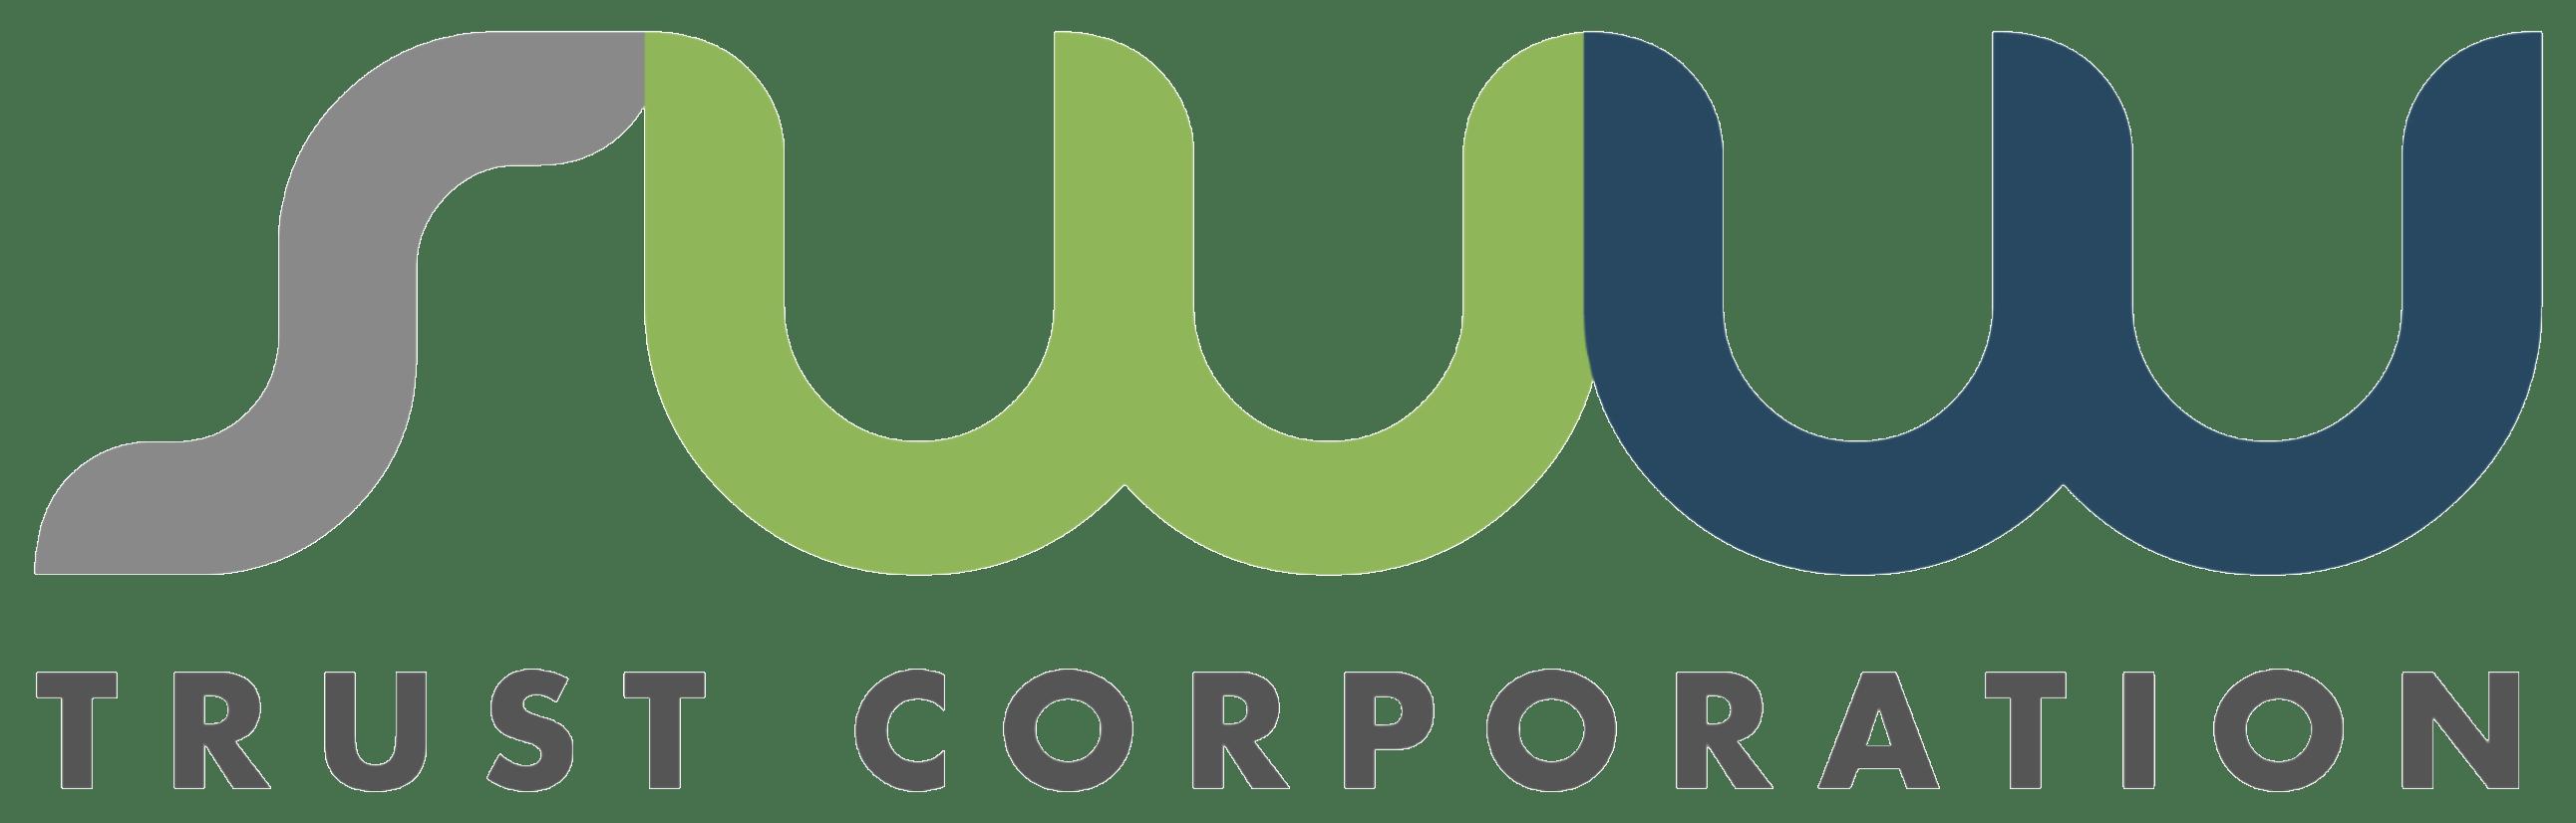 Sww corporation ten celebrities. Trust clipart lack trust